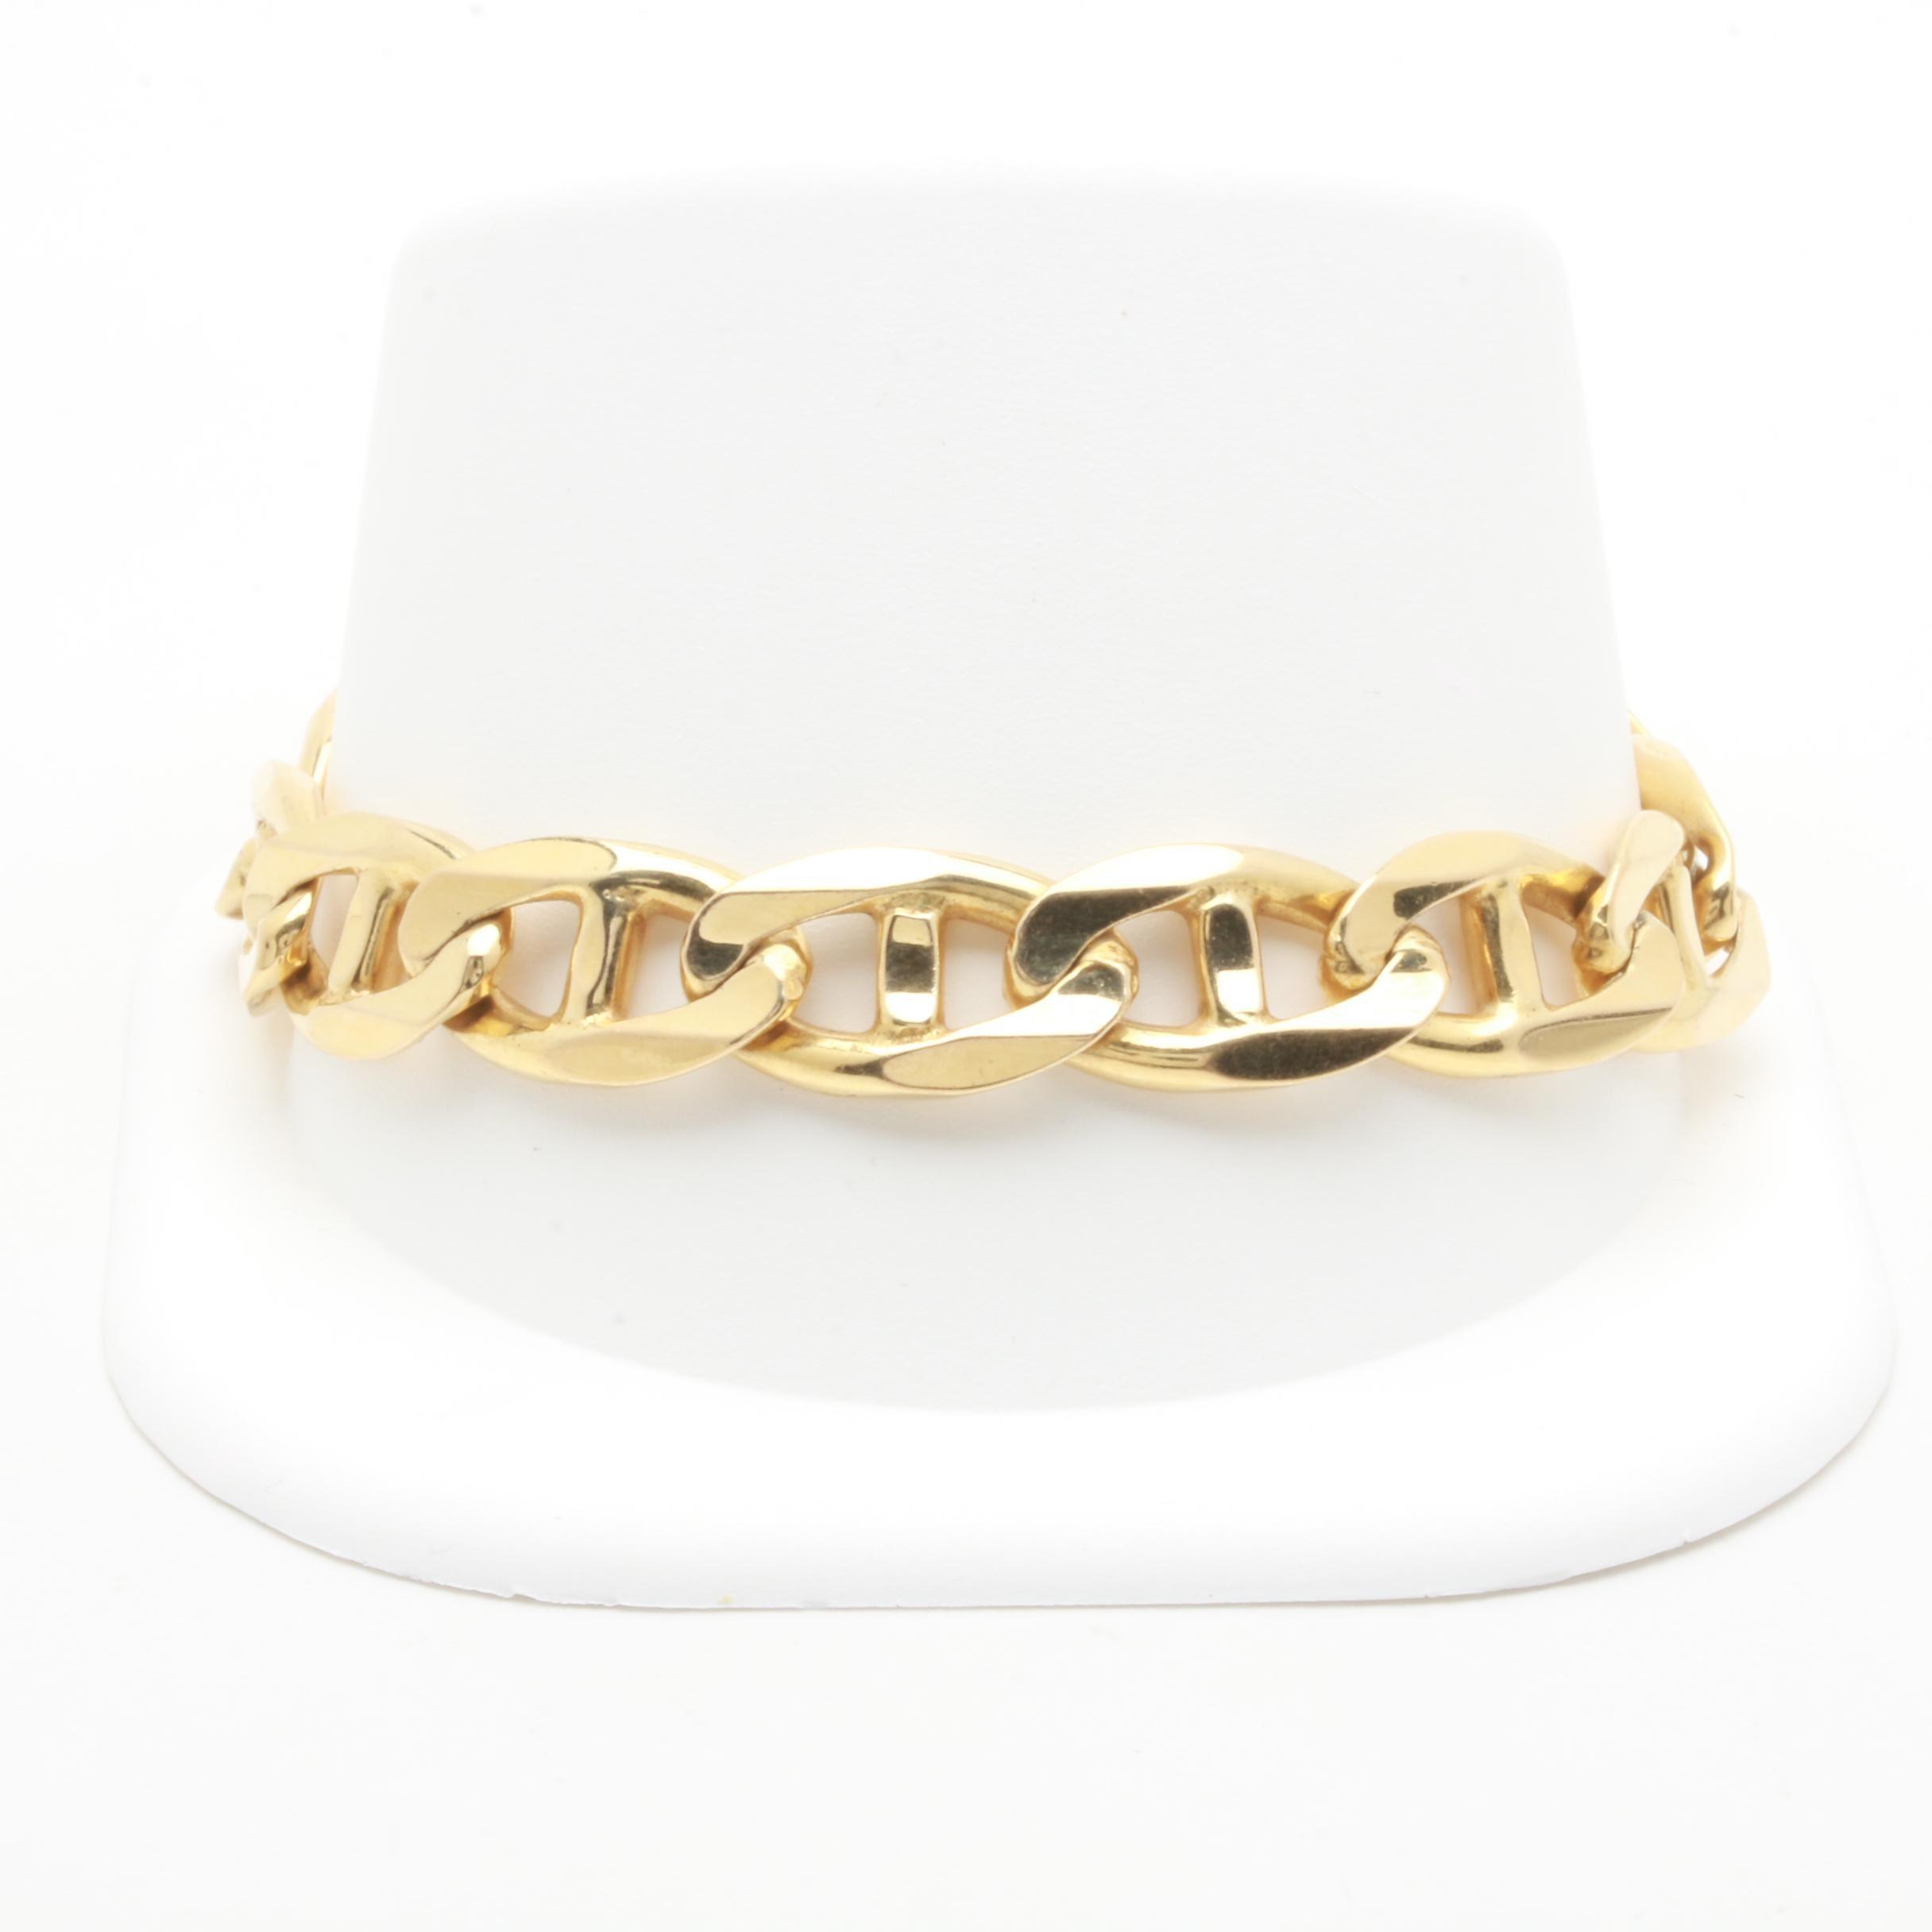 Italian 14K Yellow Gold Anchor Chain Bracelet